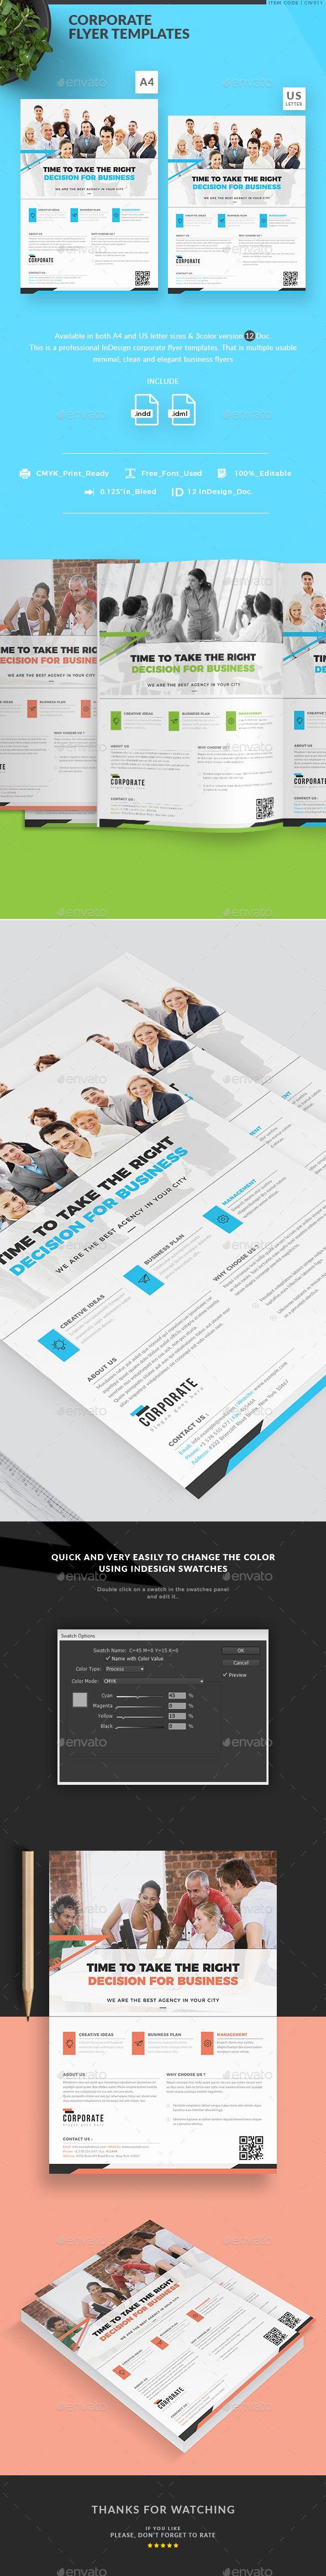 flyer templates doc